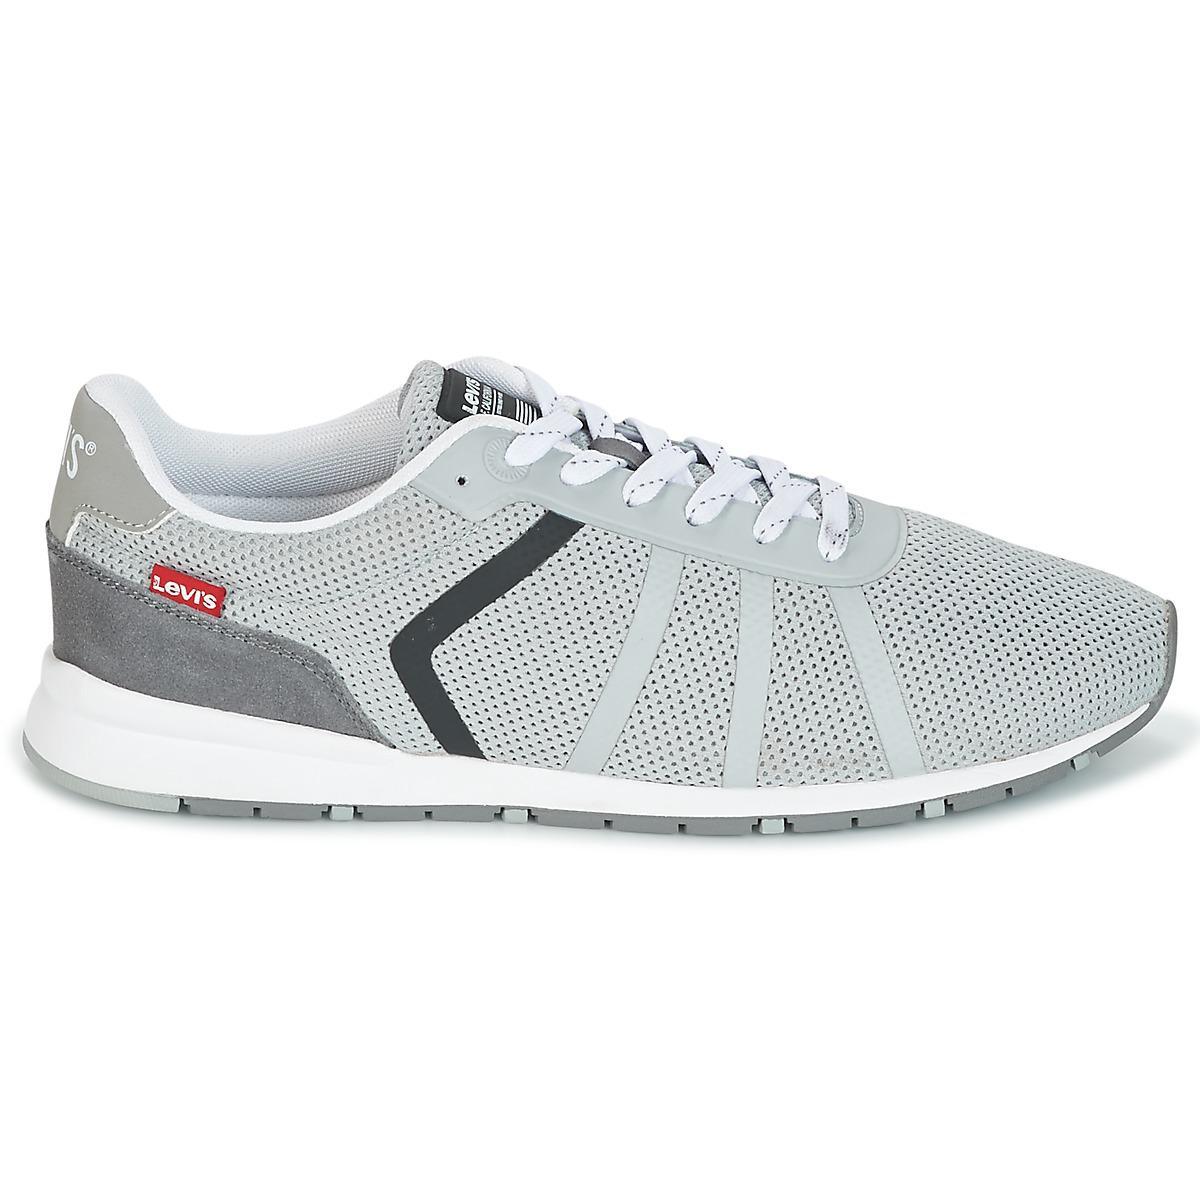 the latest 8d101 6b5cf For Almayer Shoes Levi s In Men s Lite Levis trainers Gray Grey 5ISHSxz